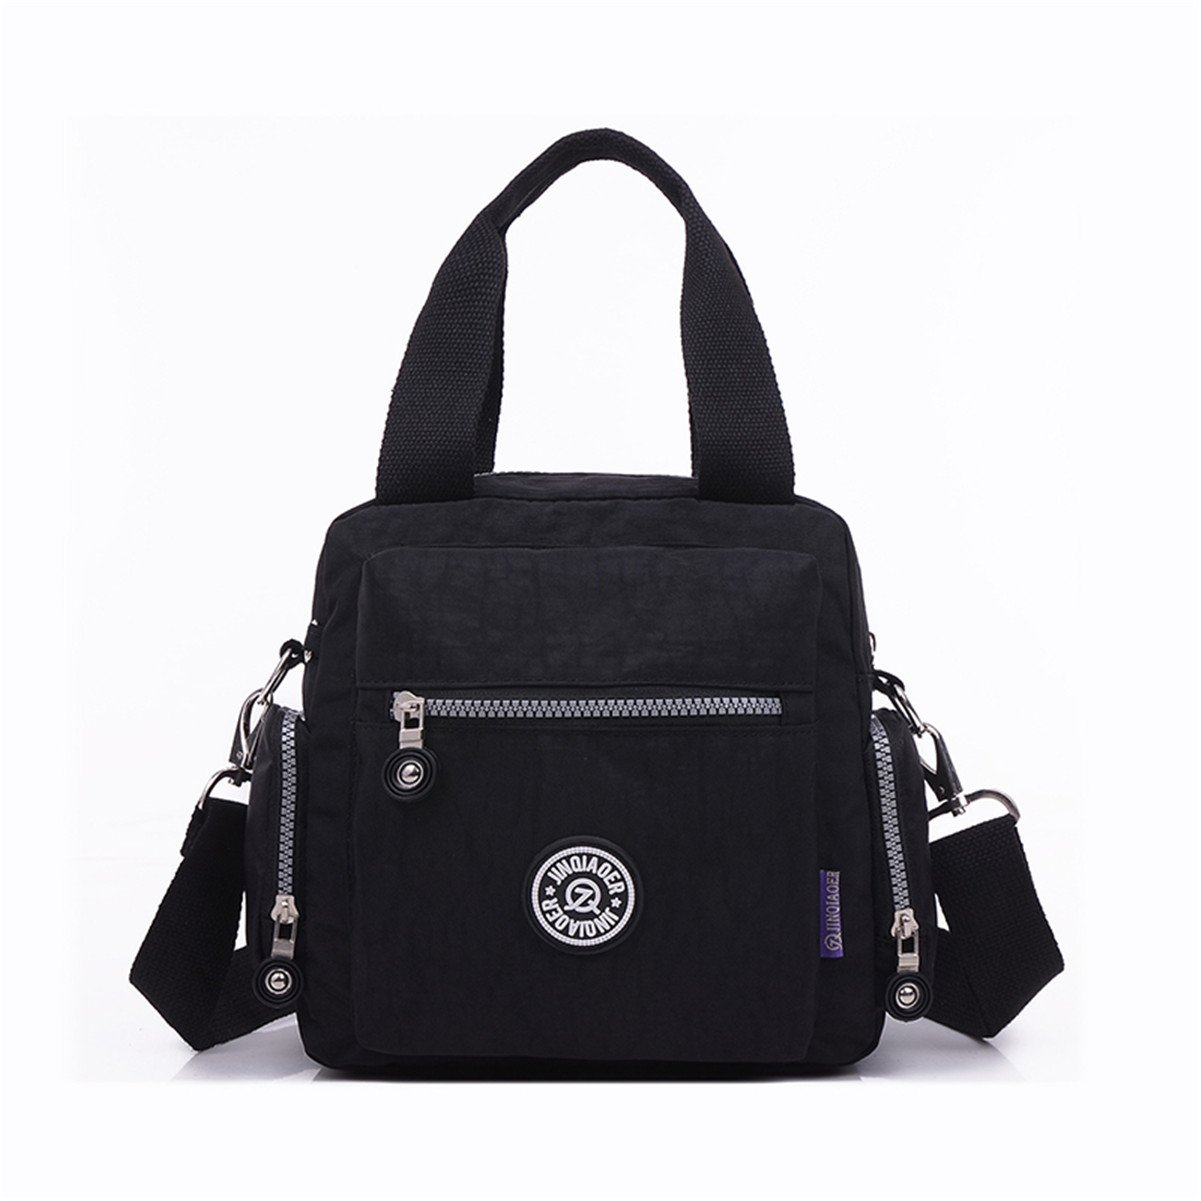 Tiny Chou Waterproof Nylon Top-handle Handbag Crossbody Messenger Bag with Detachable Shoulder Strap-Black